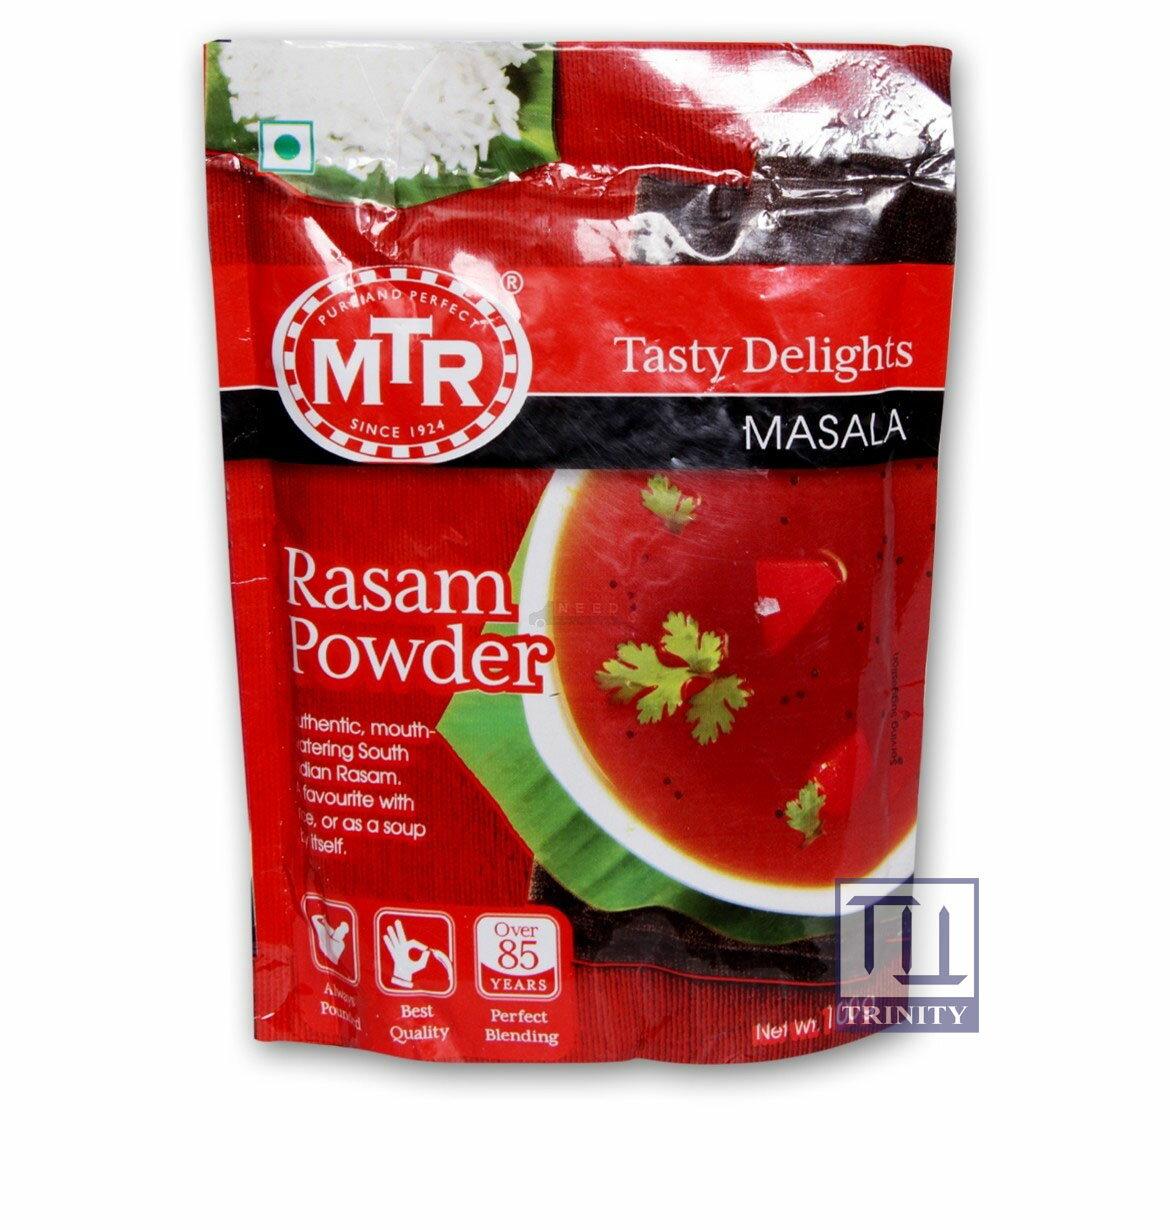 MTR Rasam Powder 印度香料粉